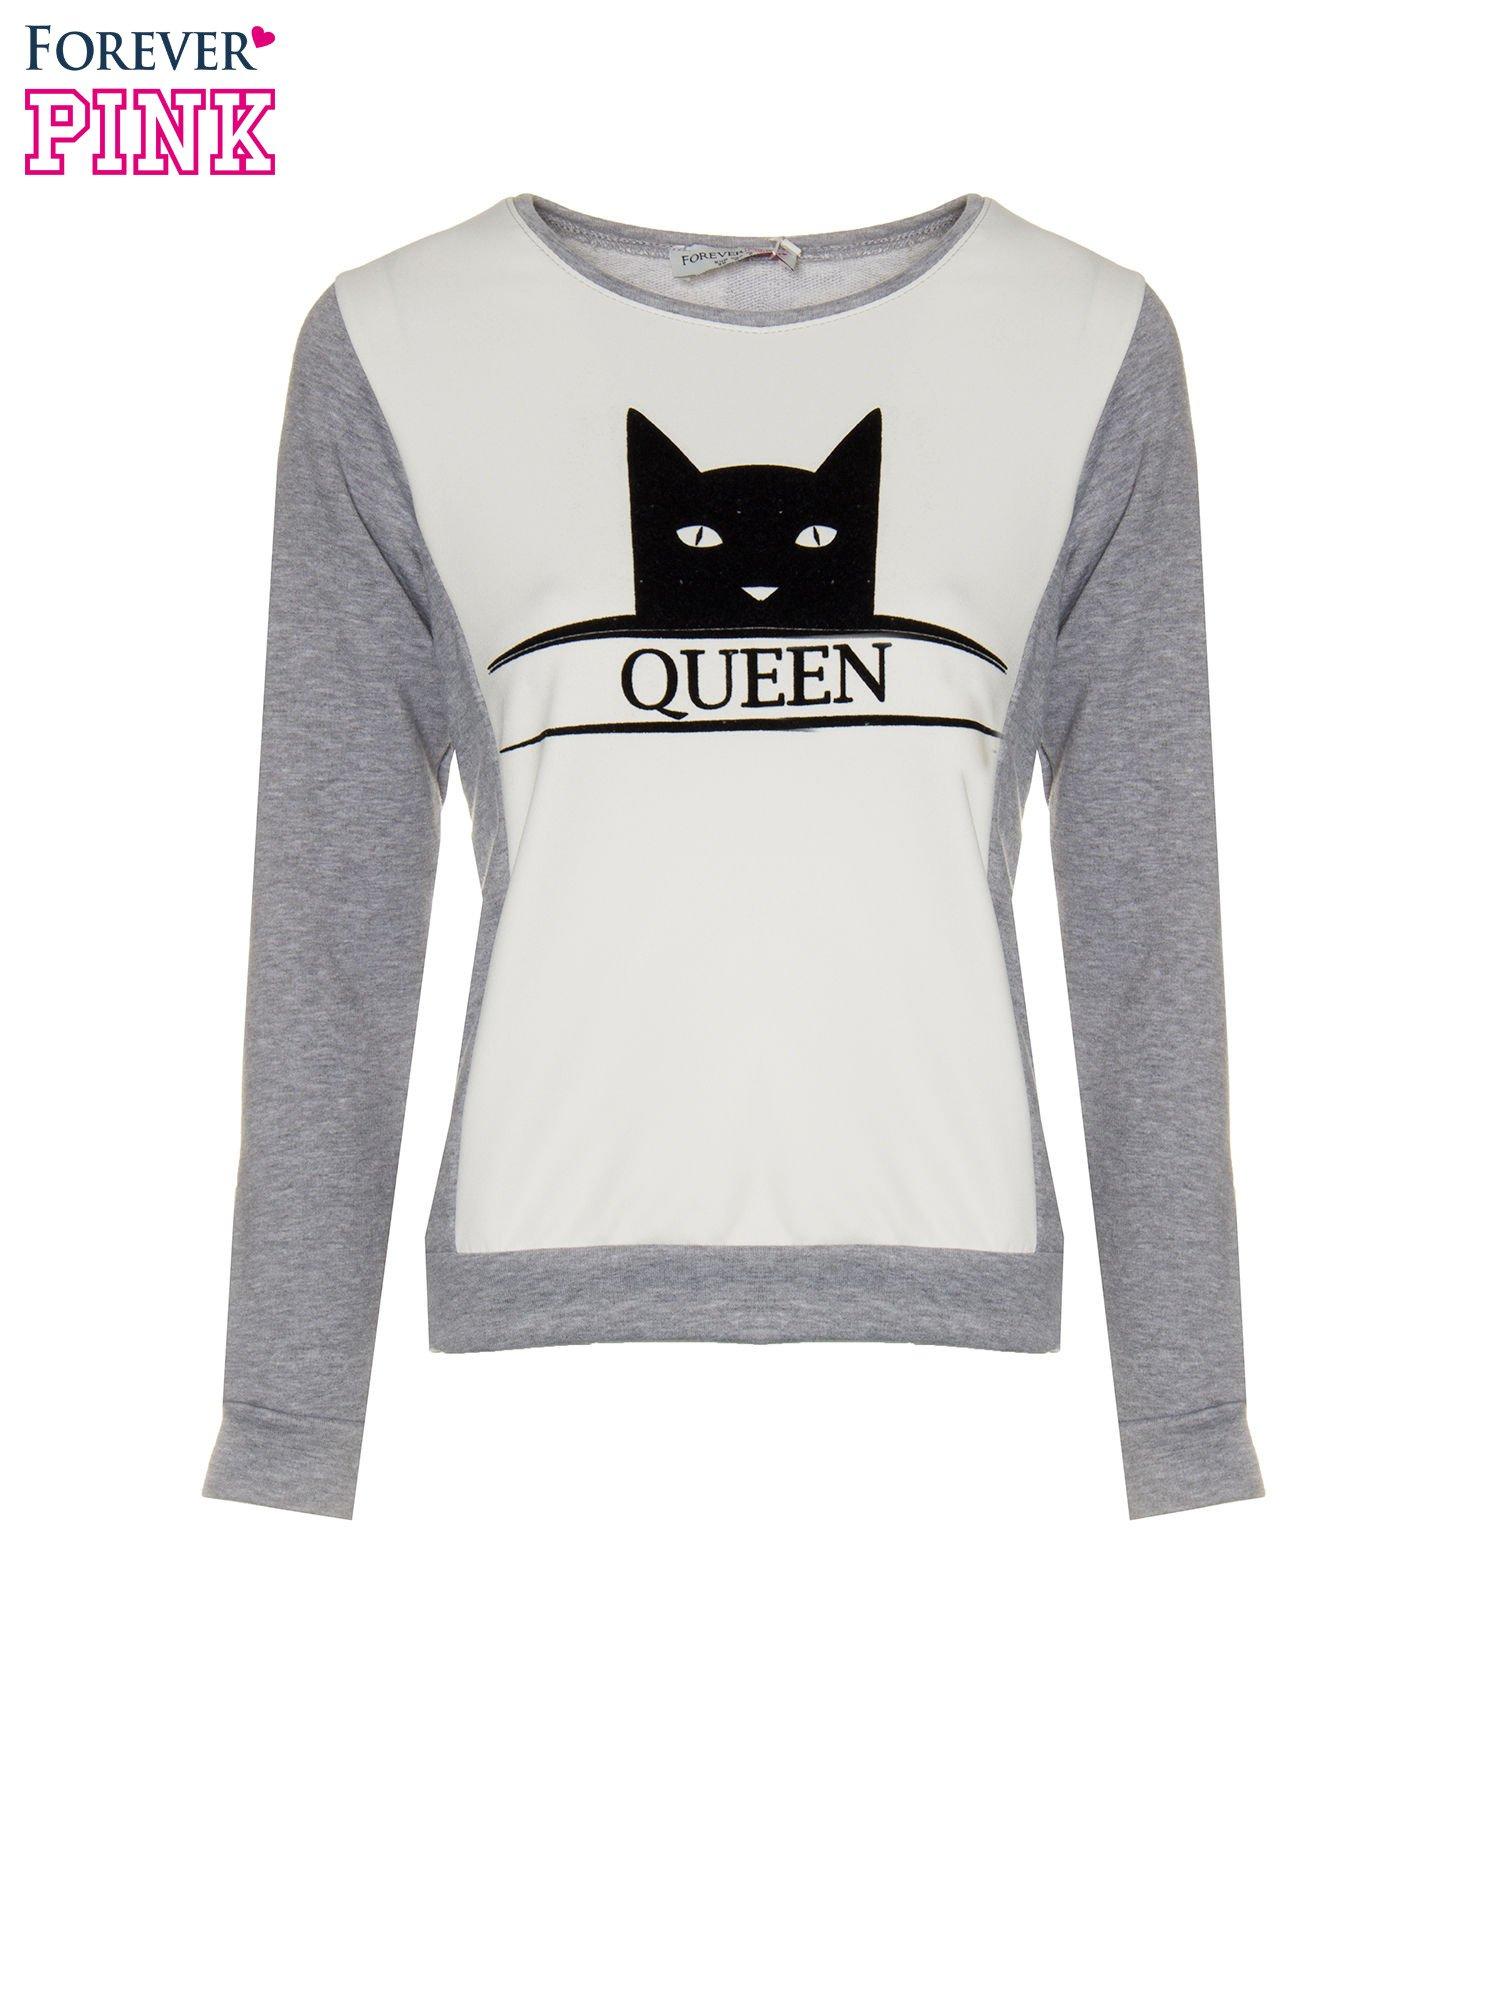 Szara dresowa bluza z nadrukiem kota i napisem QUEEN                                  zdj.                                  5